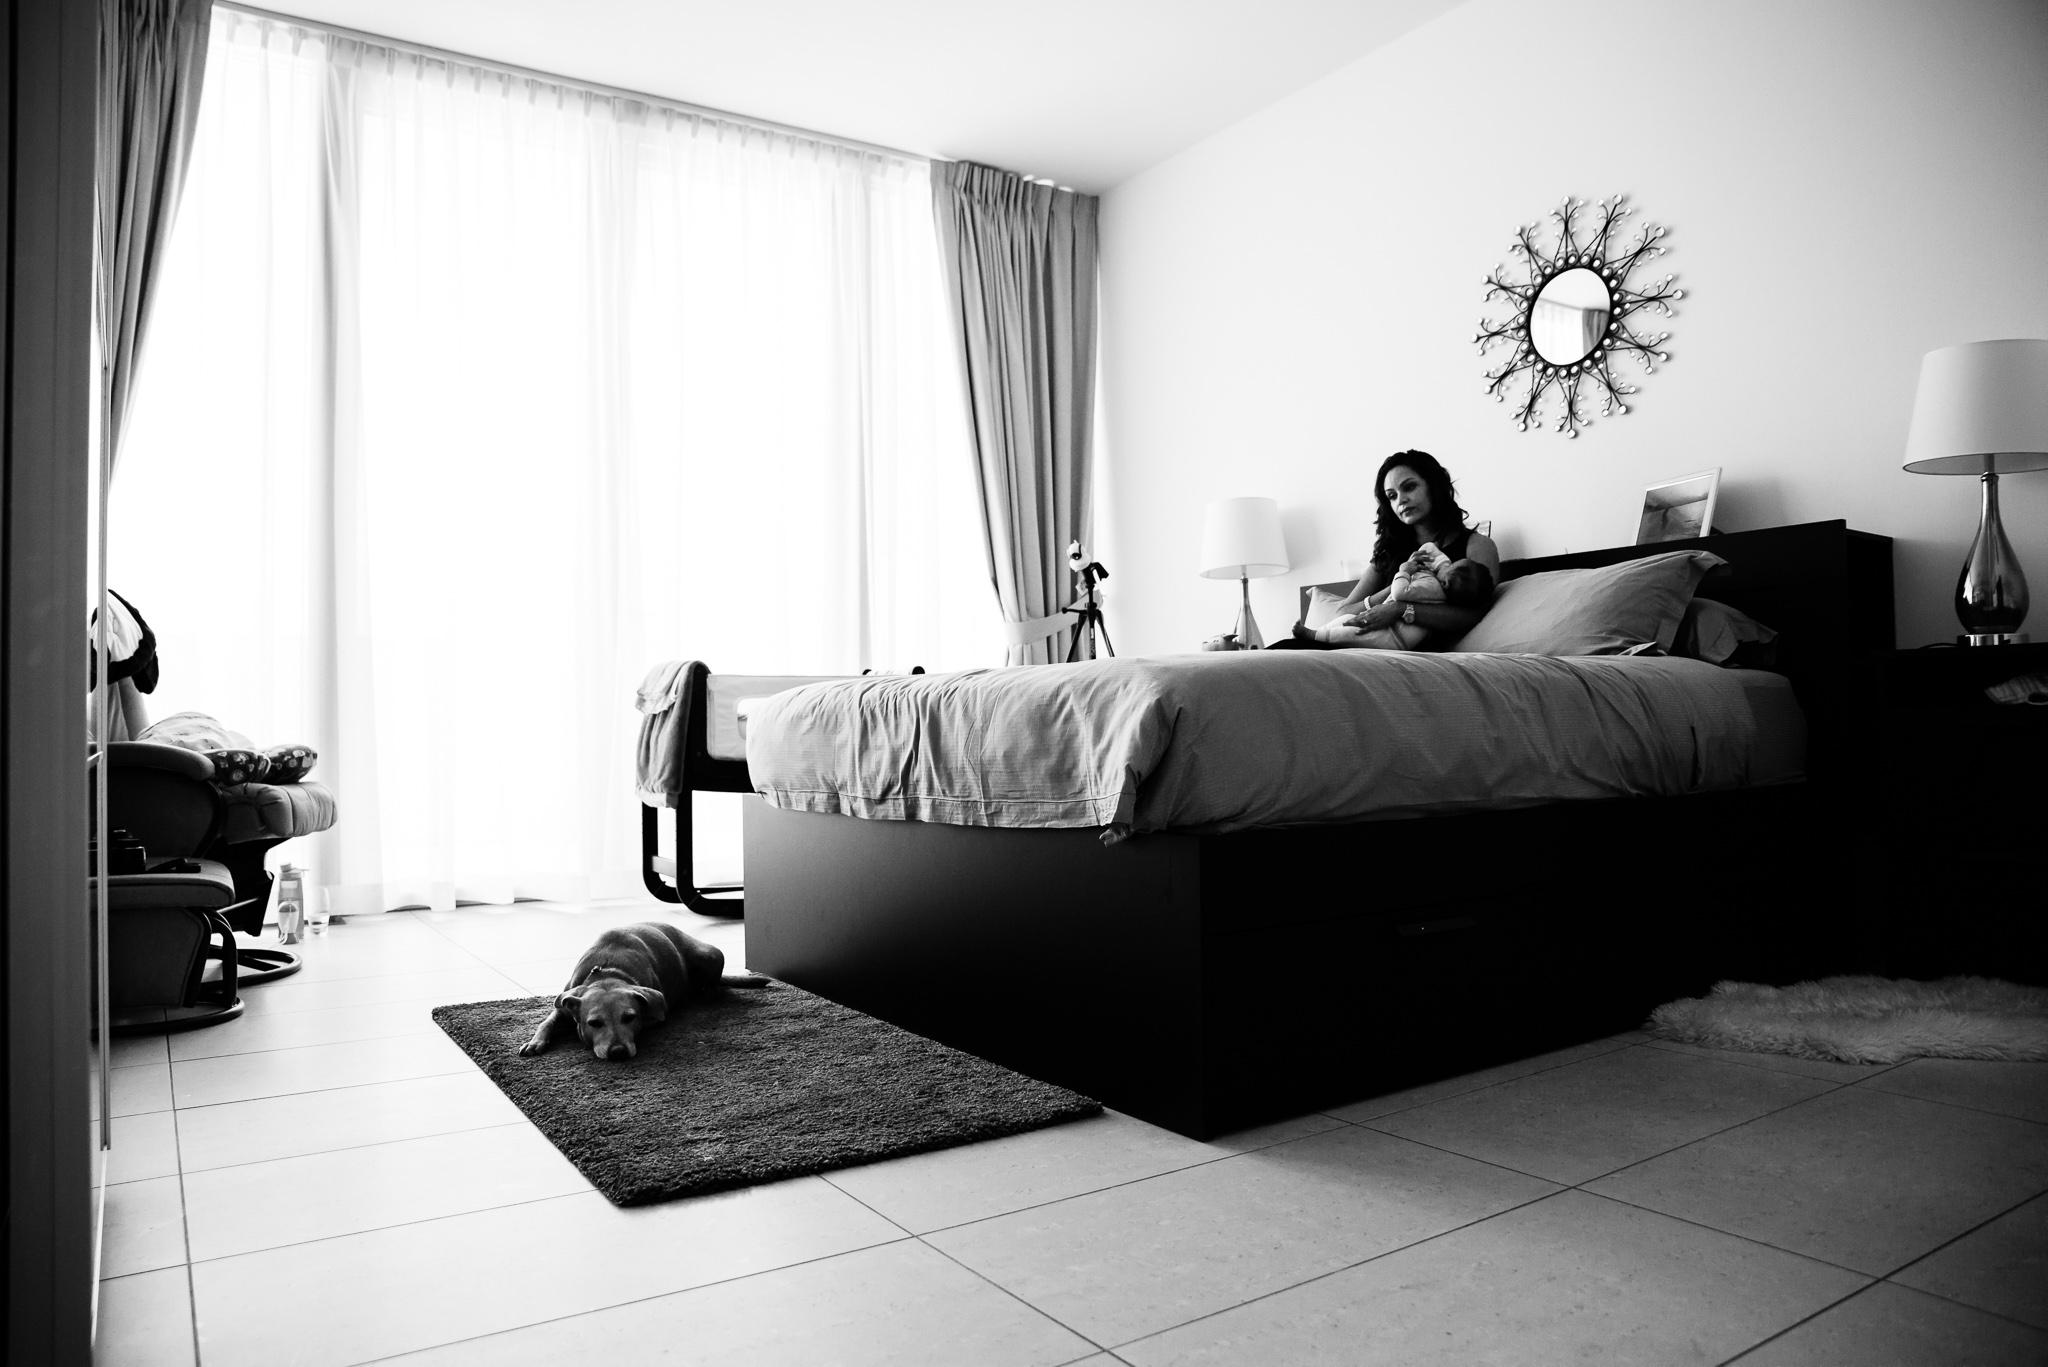 Lana-Photographs-Abu-Dhabi-Newborn-Photographer-Egla-PSLR-17.jpg